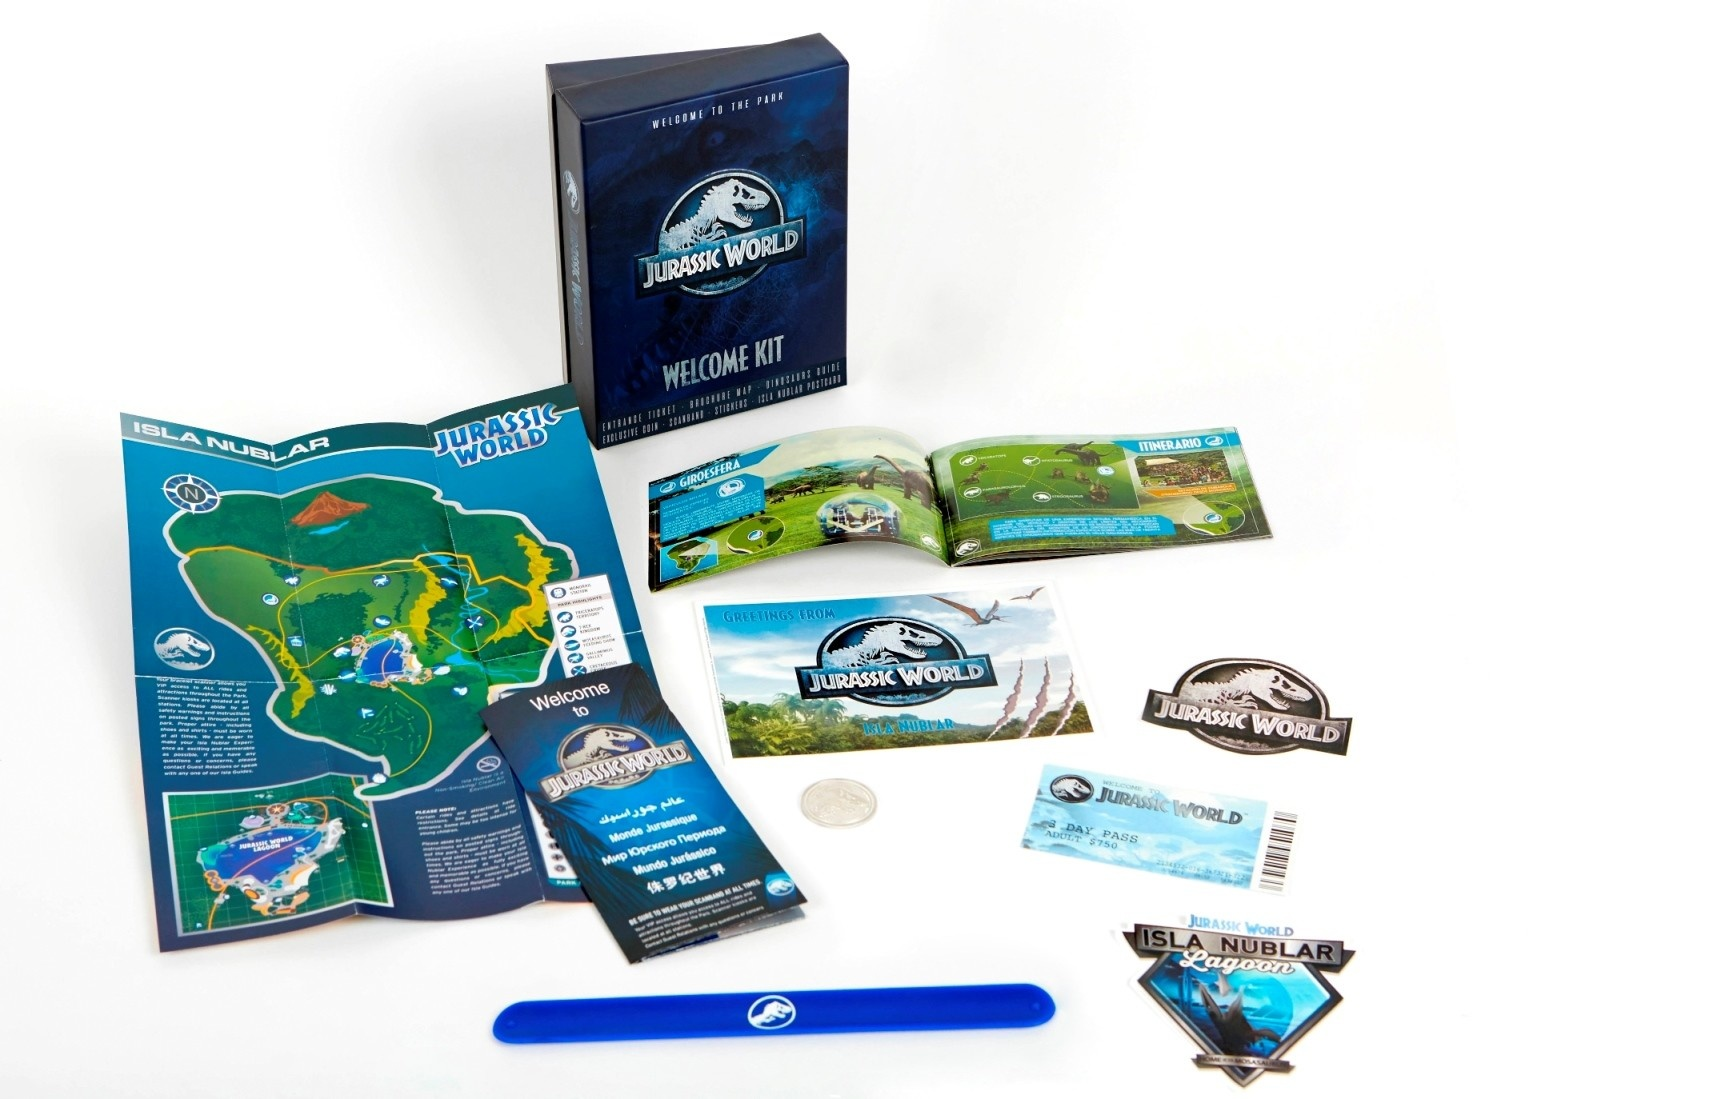 Jurassic World: Welcome Kit